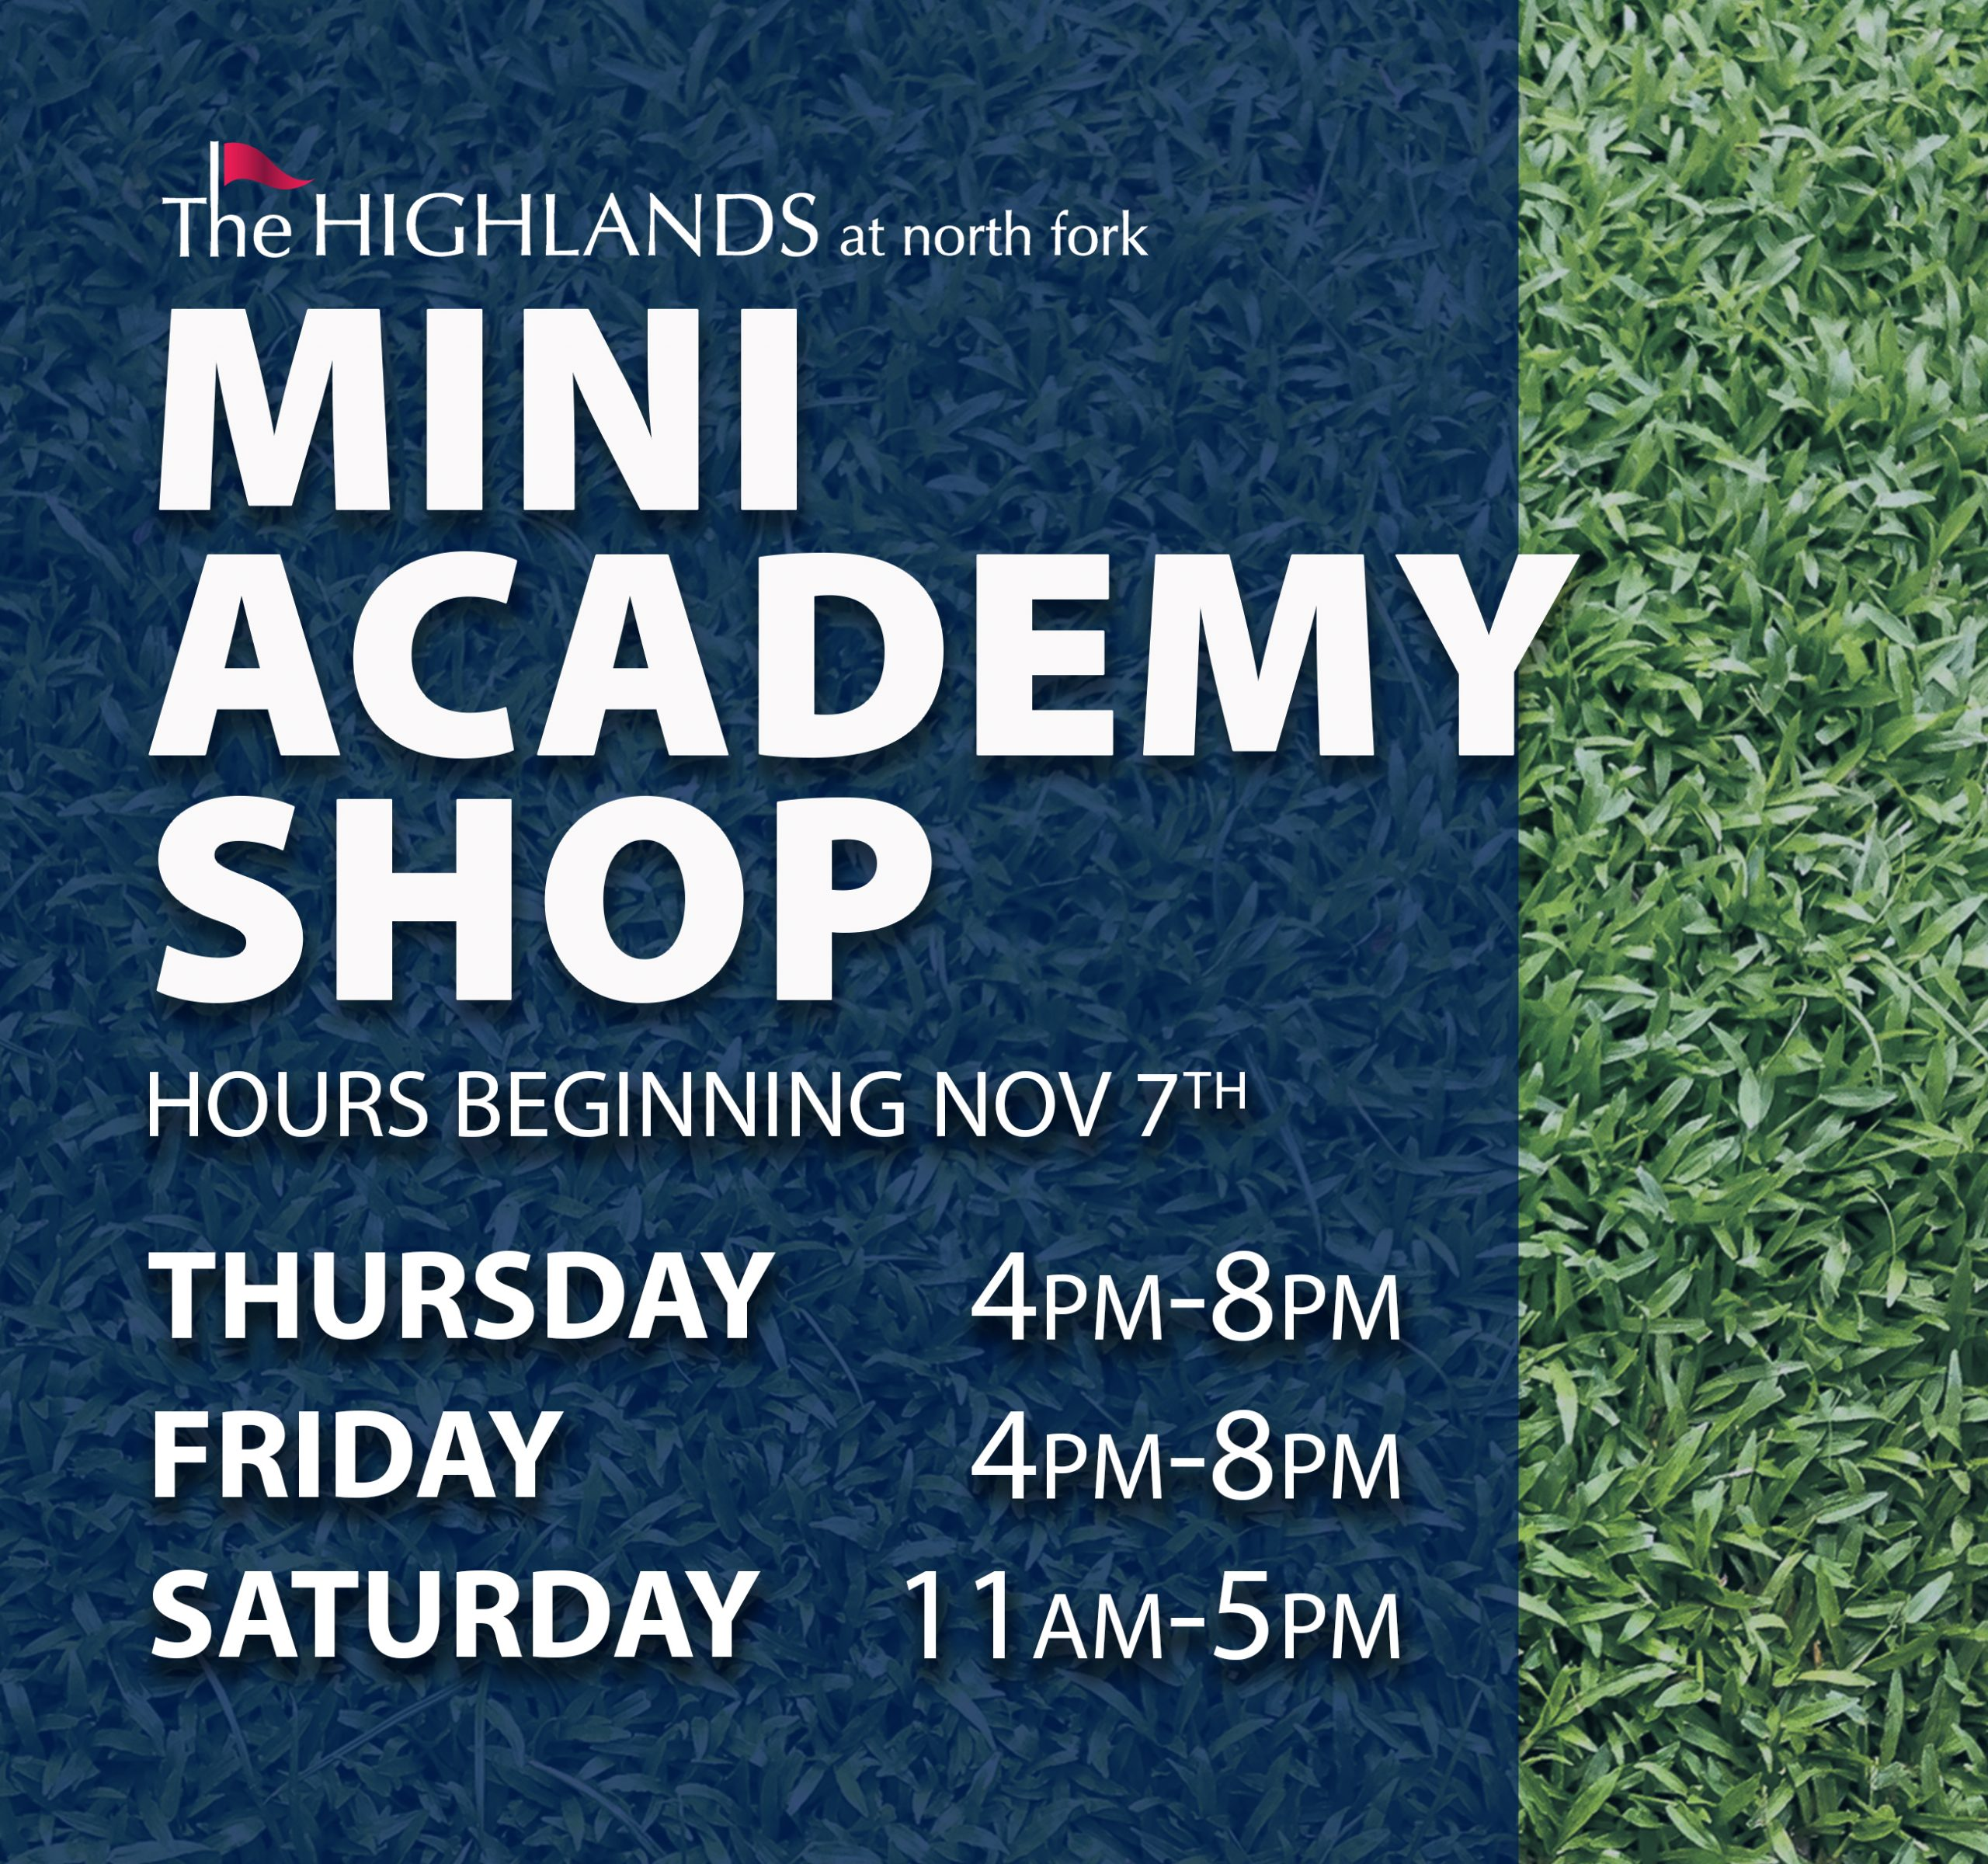 Mini-Academy Shop